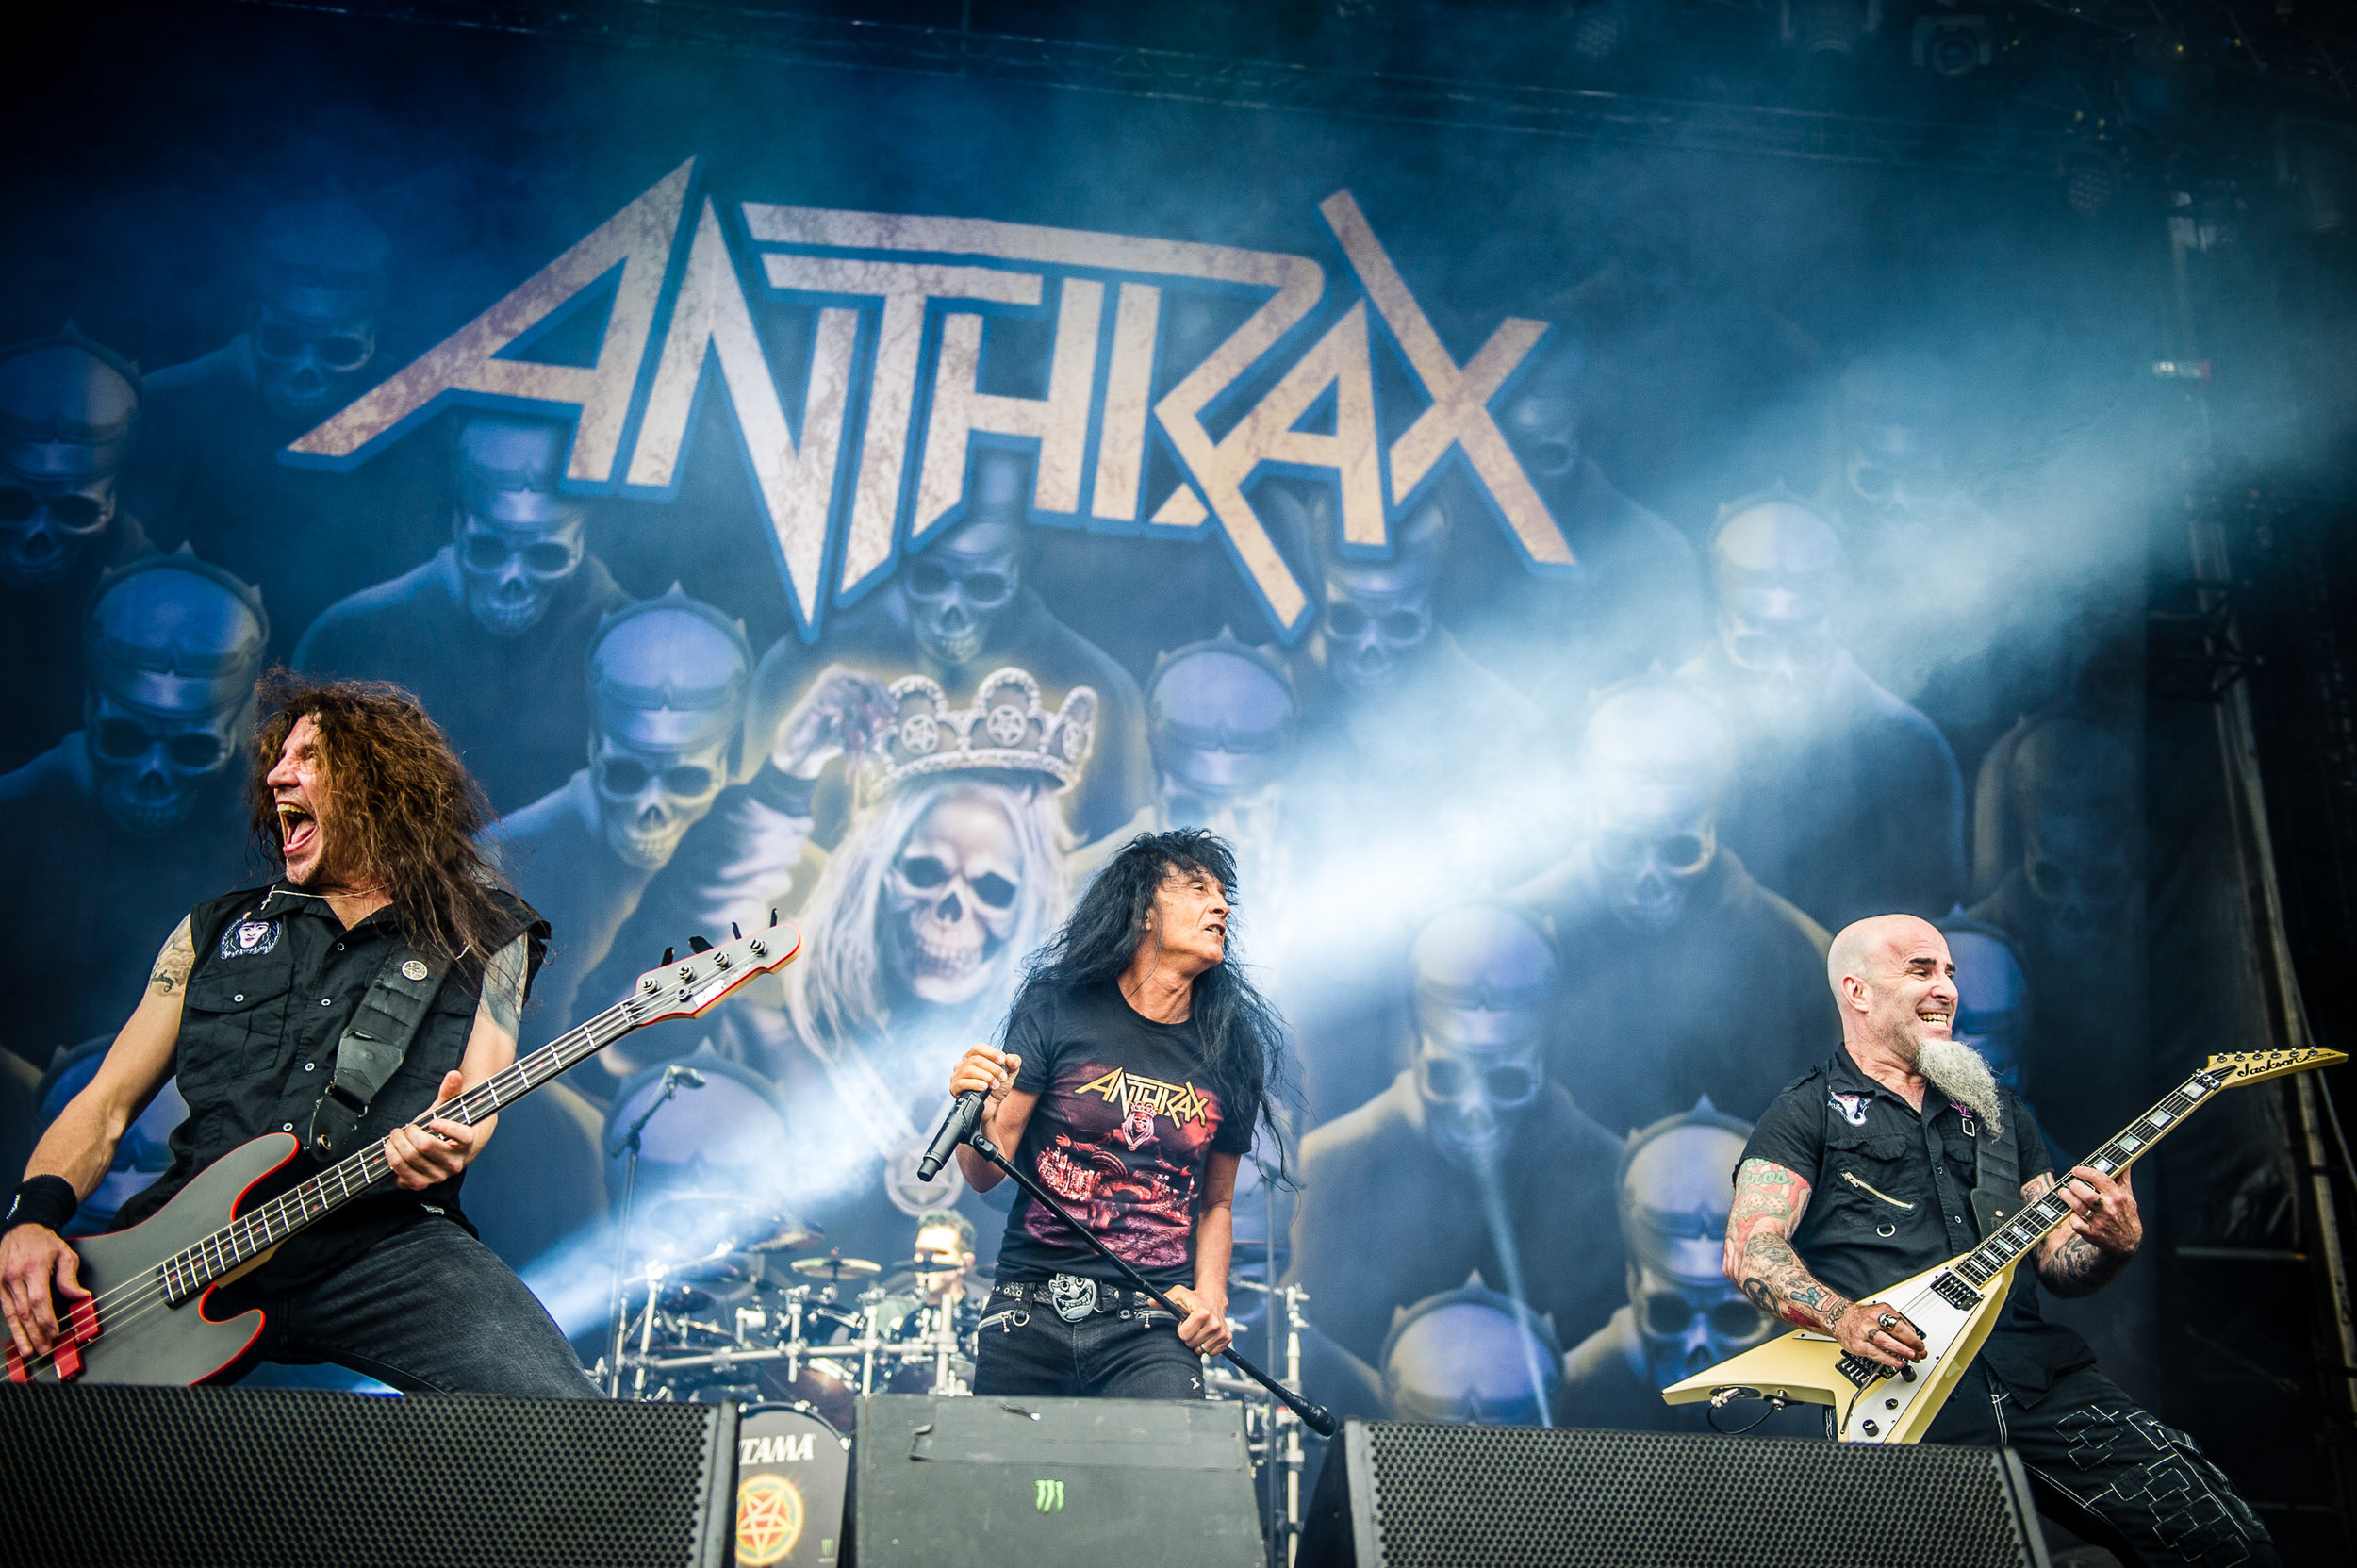 anthrax_download_sydney_01.jpg